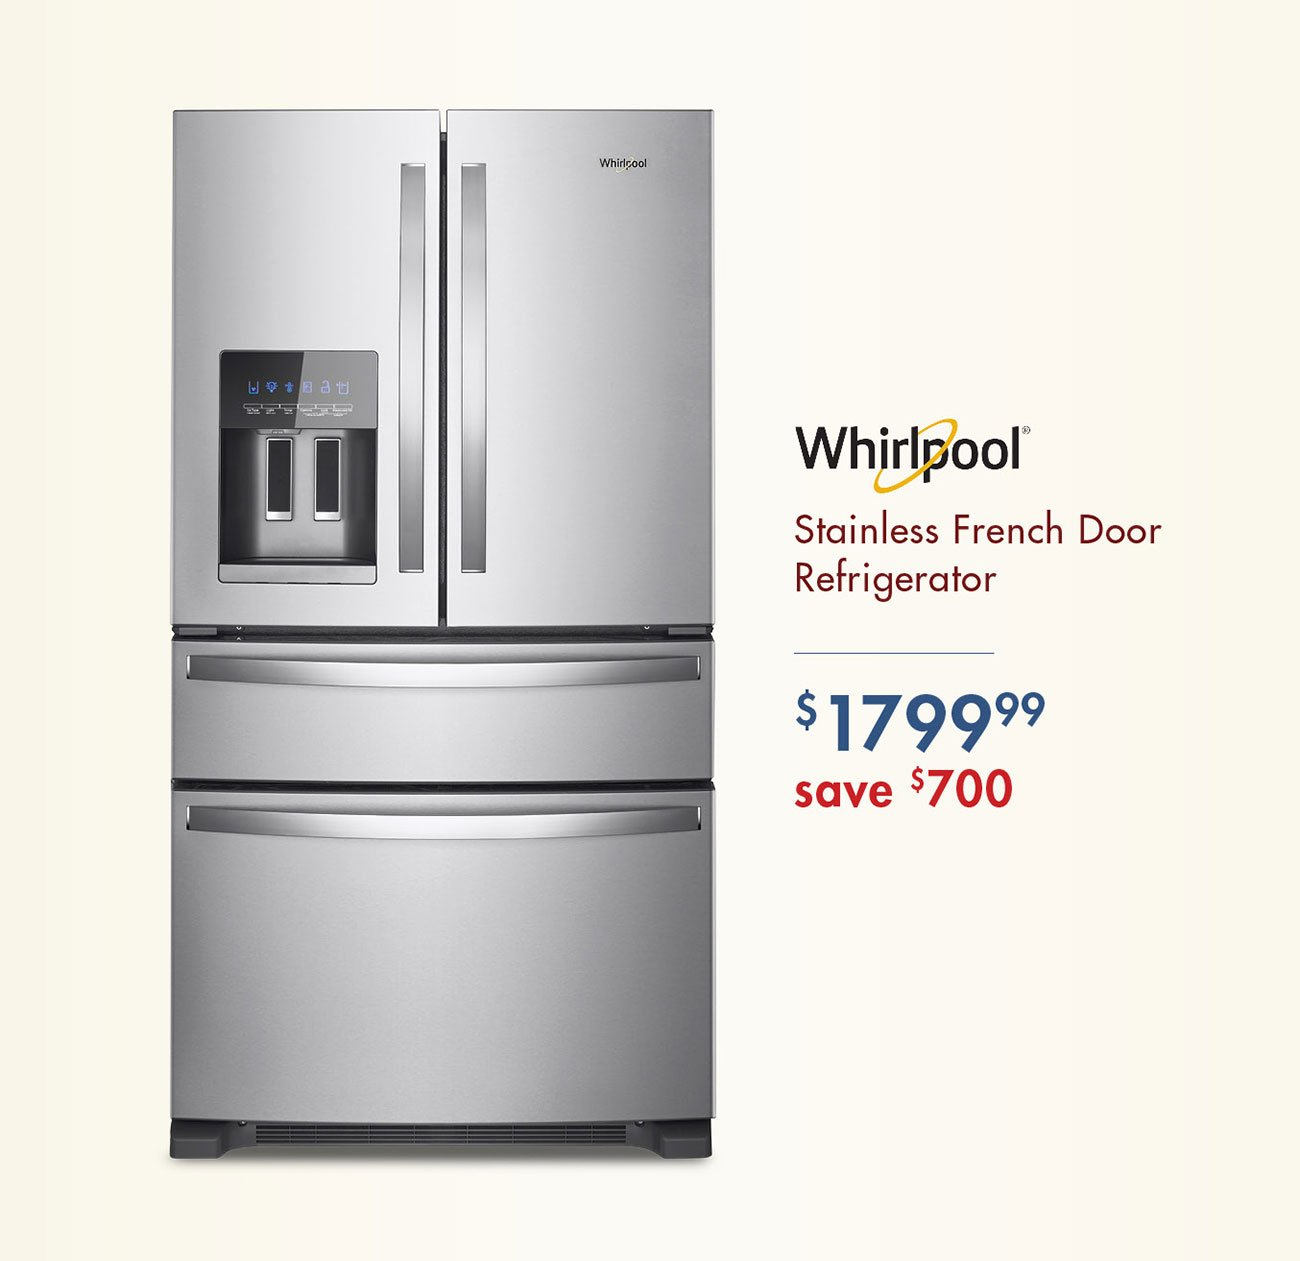 Whirlpool-french-door-refrigerator